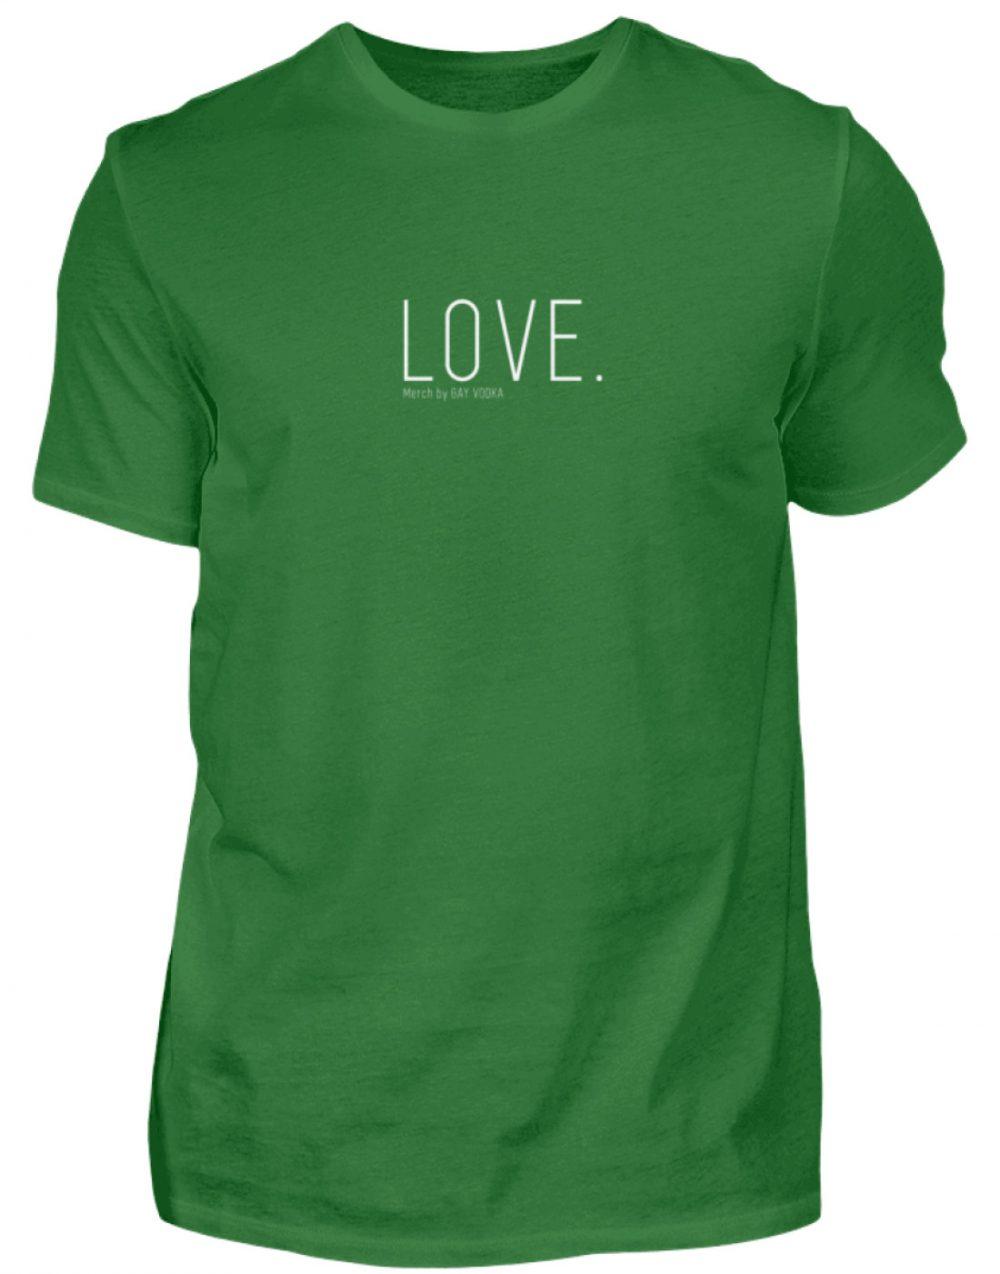 LOVE. - Herren Shirt-718